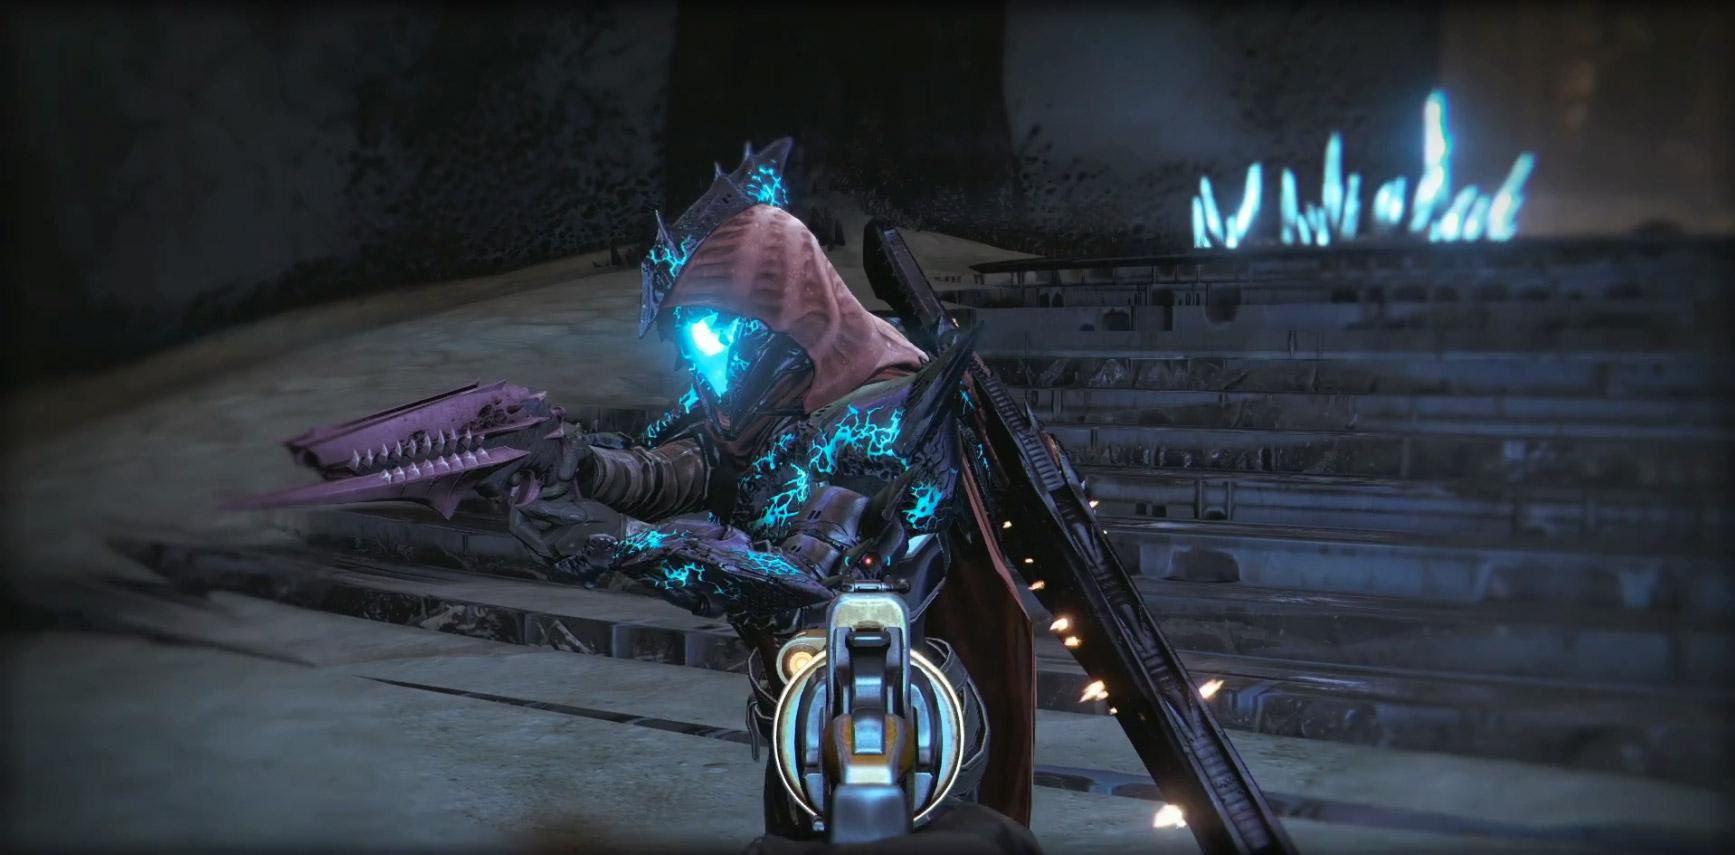 destiny 2 nightfall raid guide